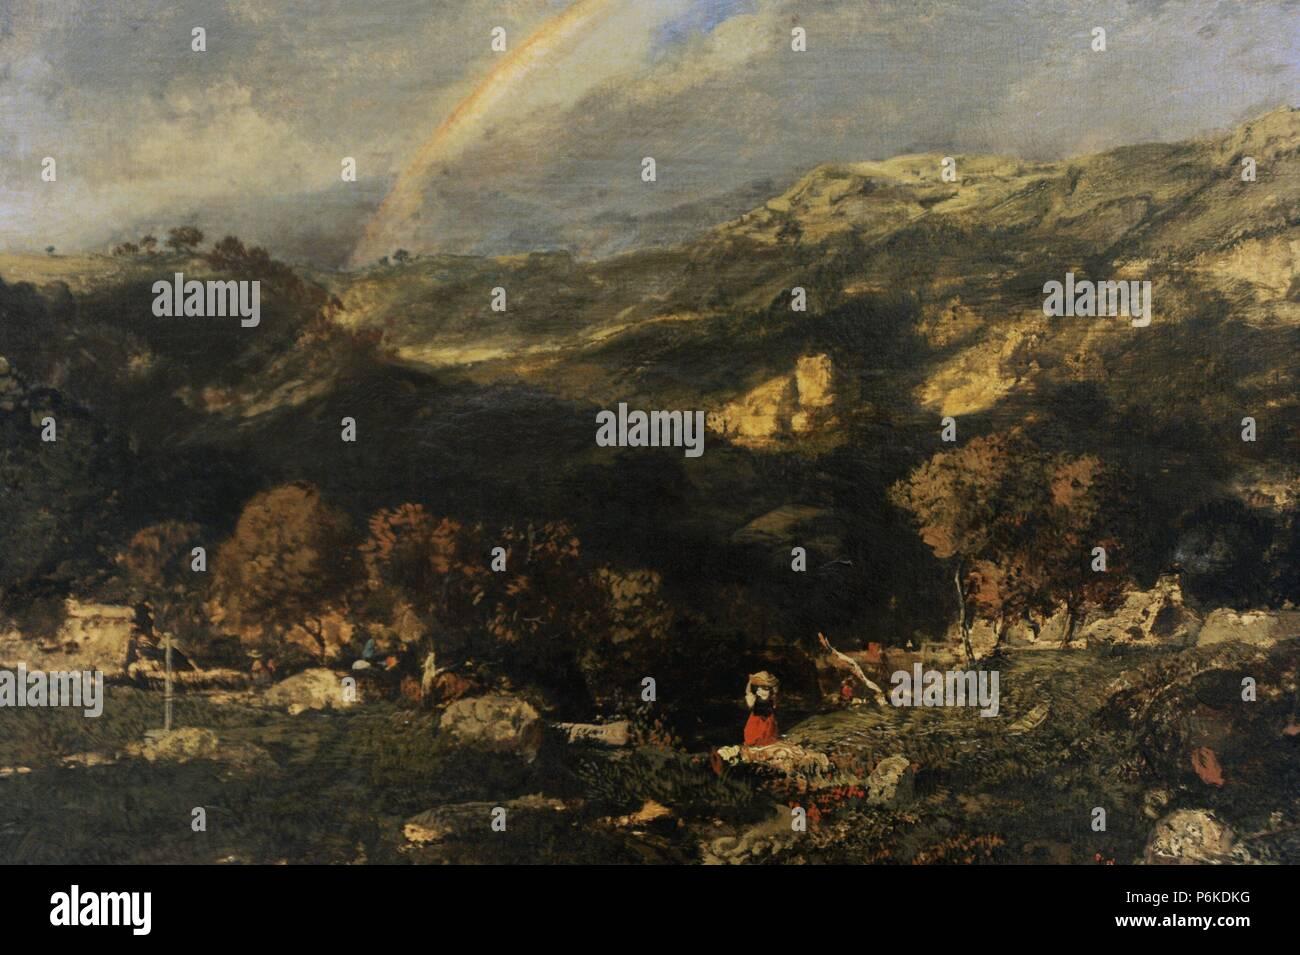 Theodore Rousseau (1812-1867). French painter. Field on rain, 1834/1835. Barbizon School. National Gallery. Prague. - Stock Image